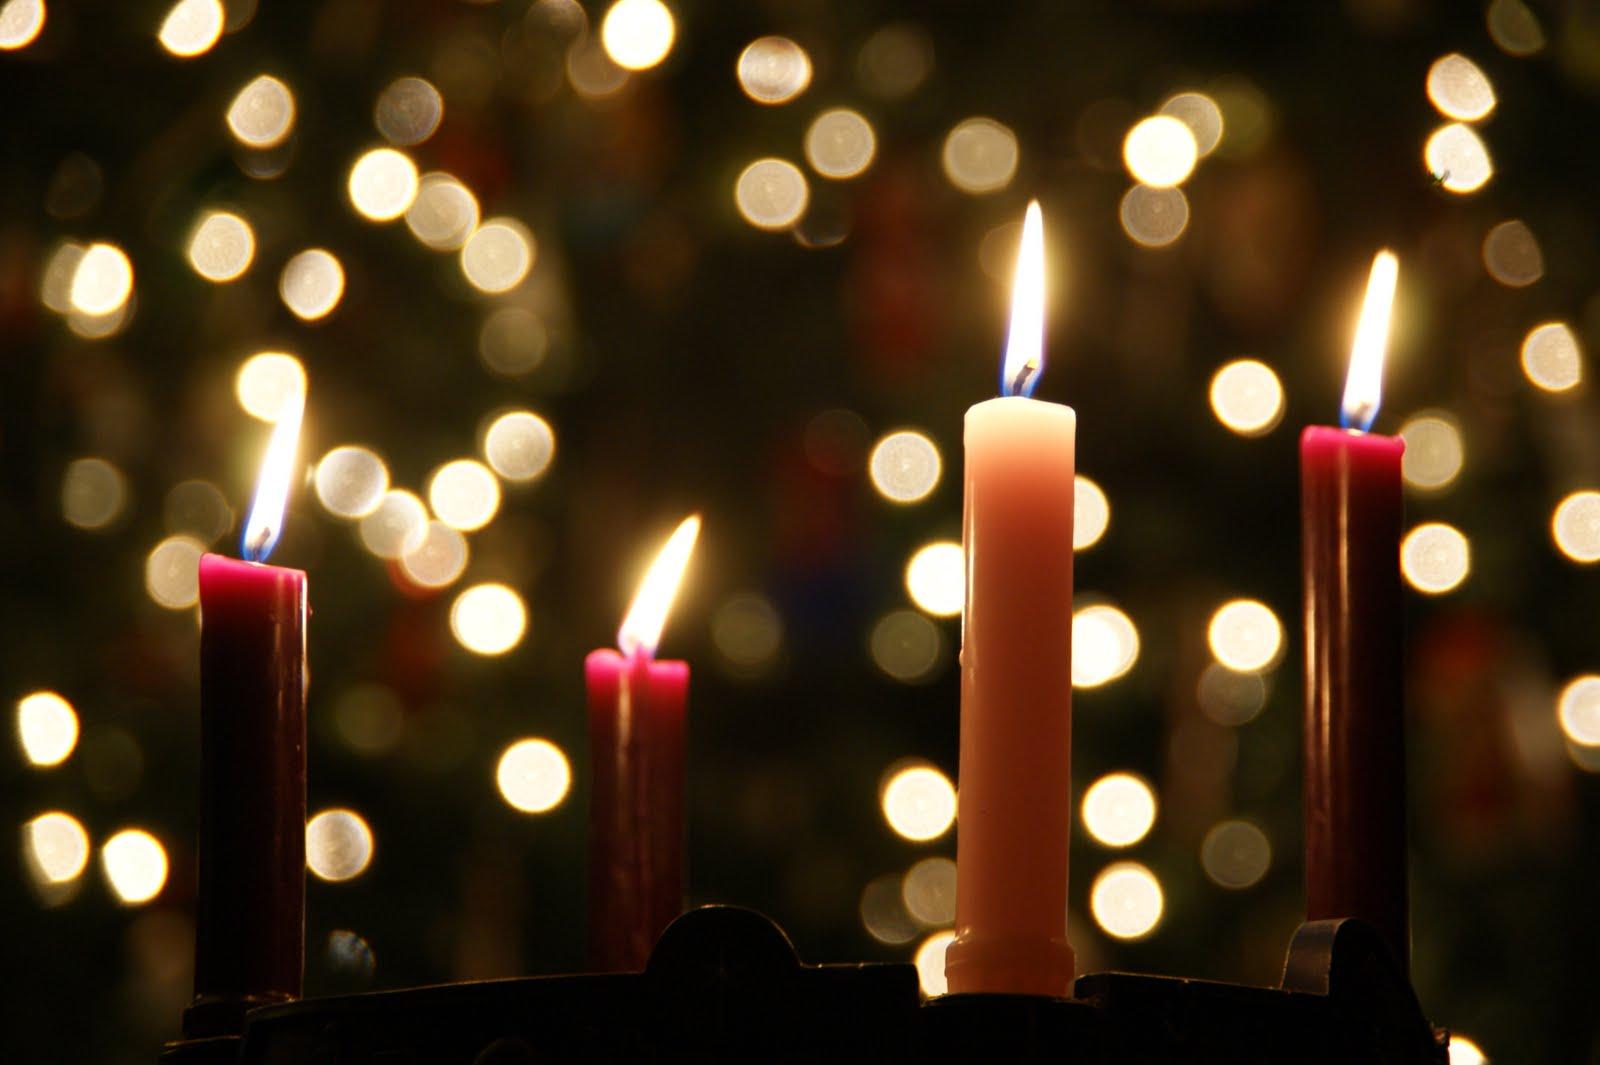 ideas for christmas carol service